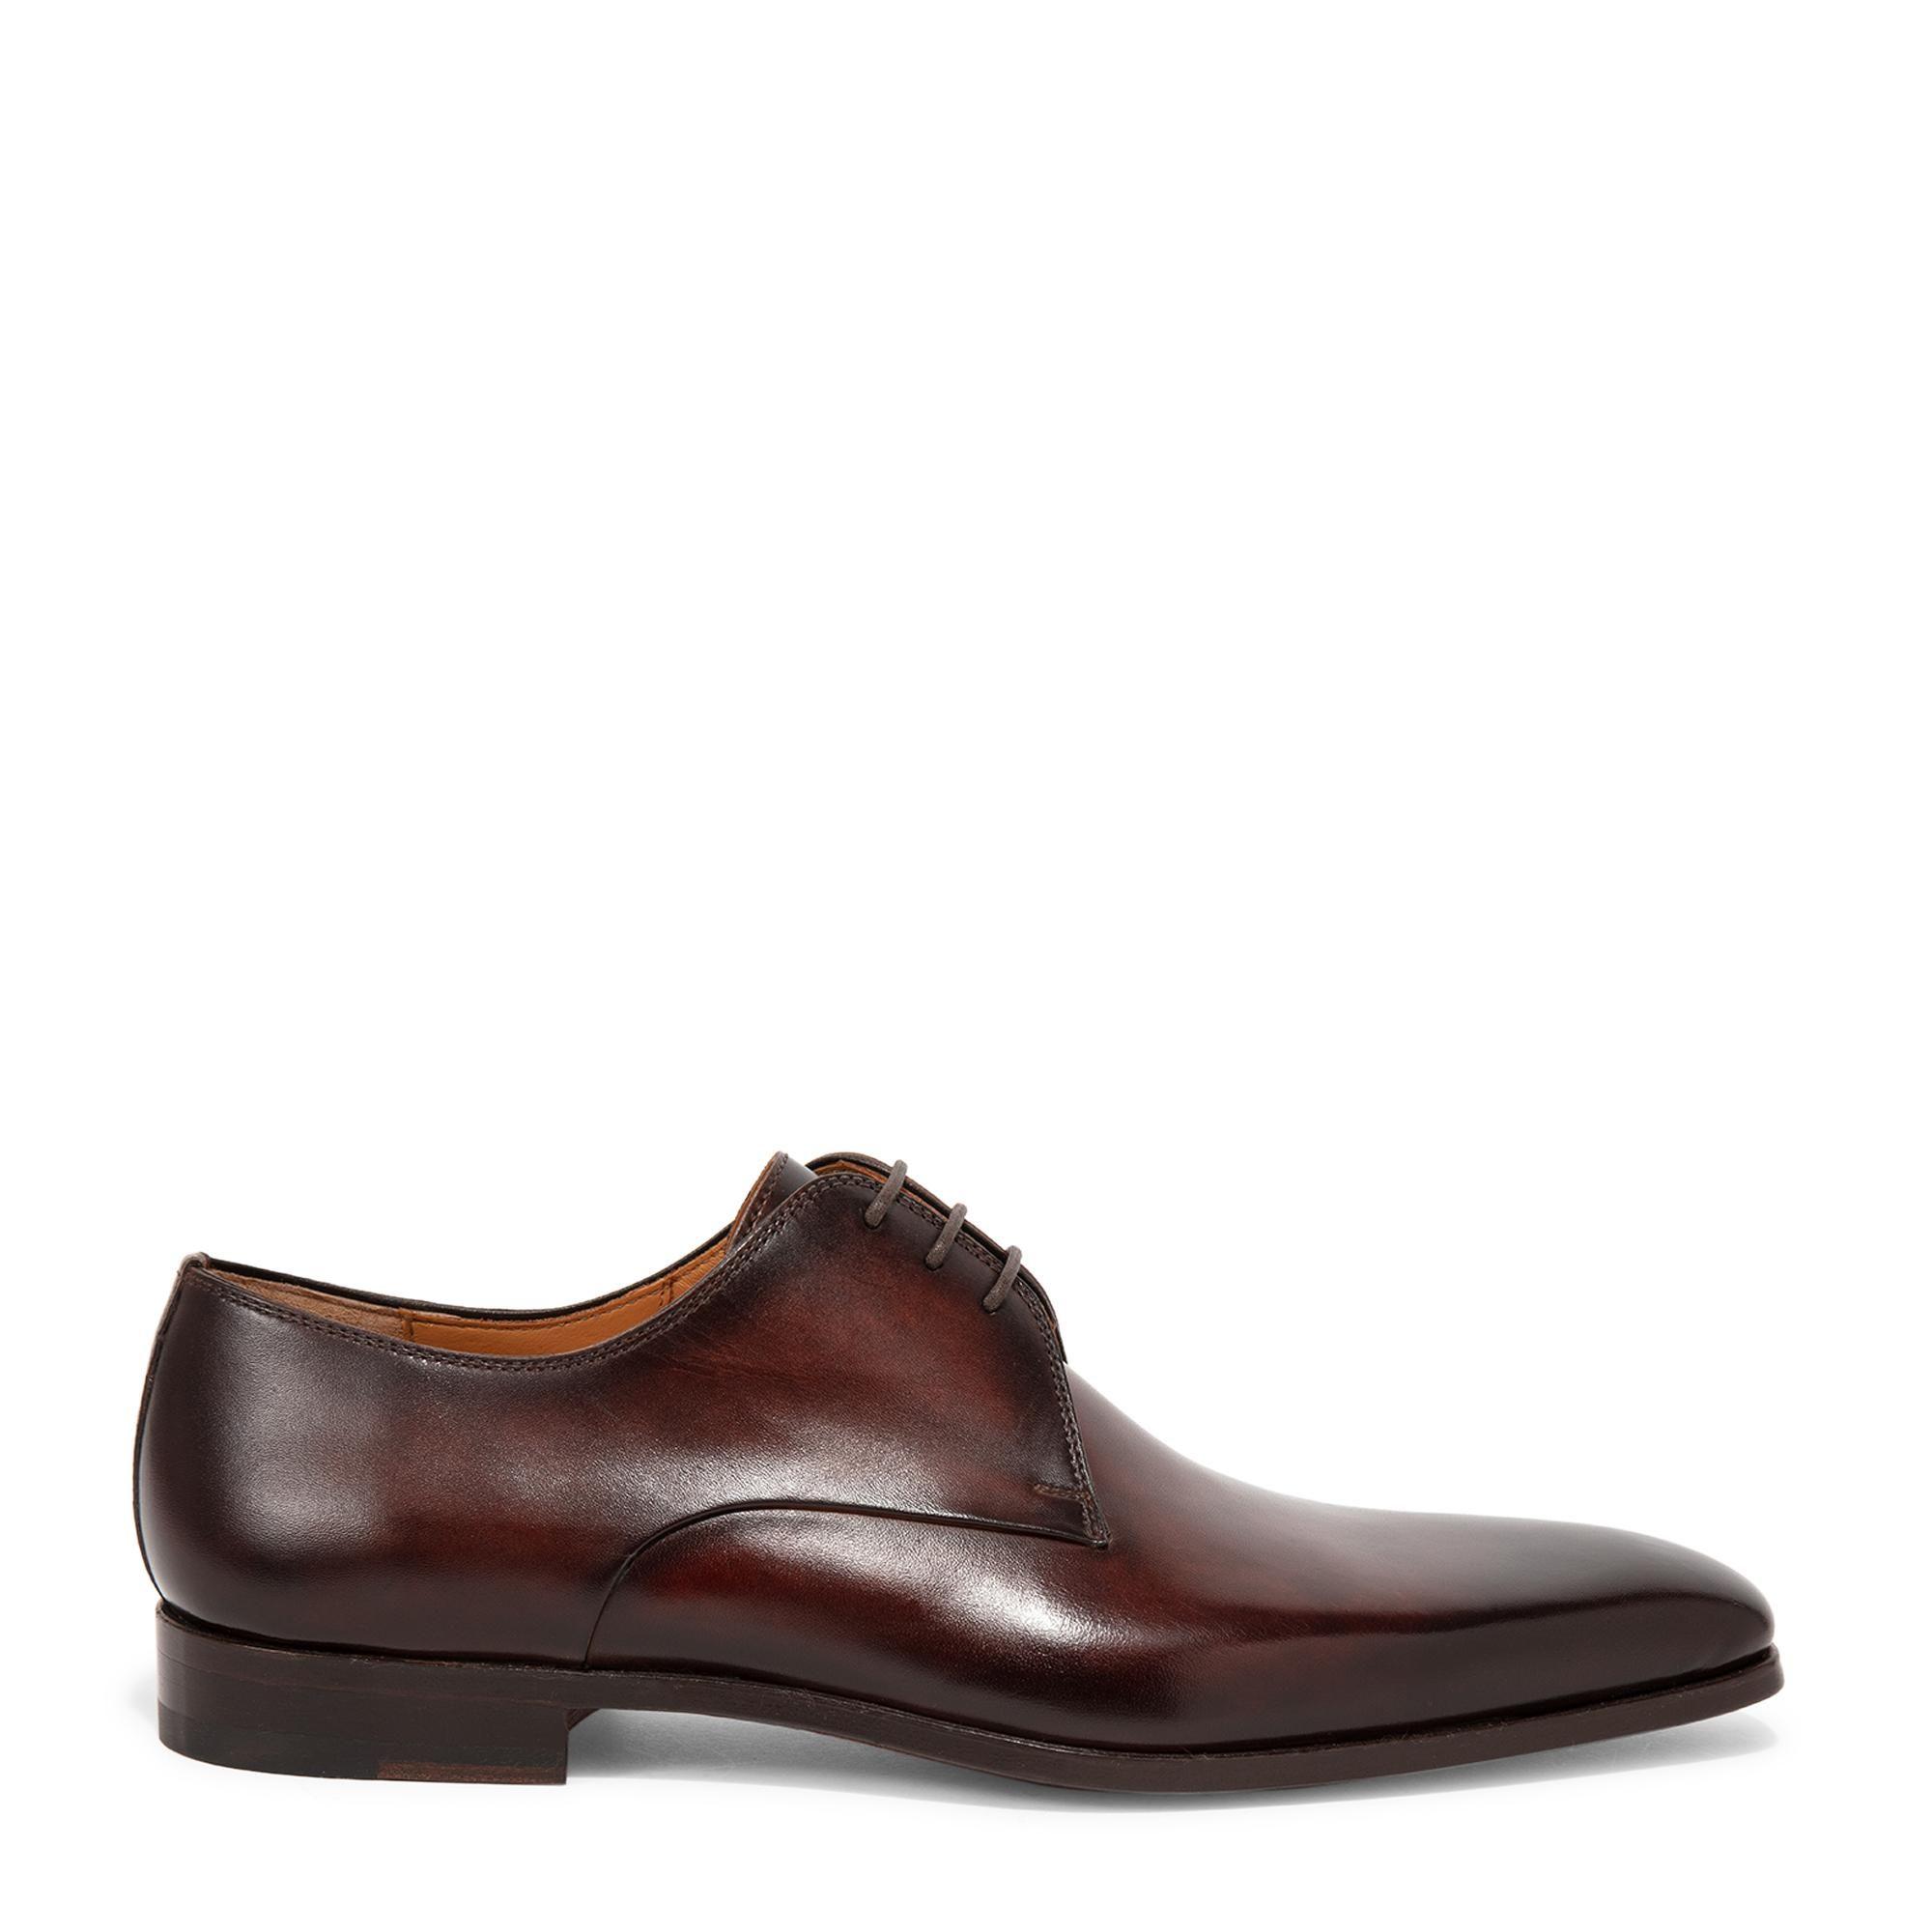 Derby lace-up shoes